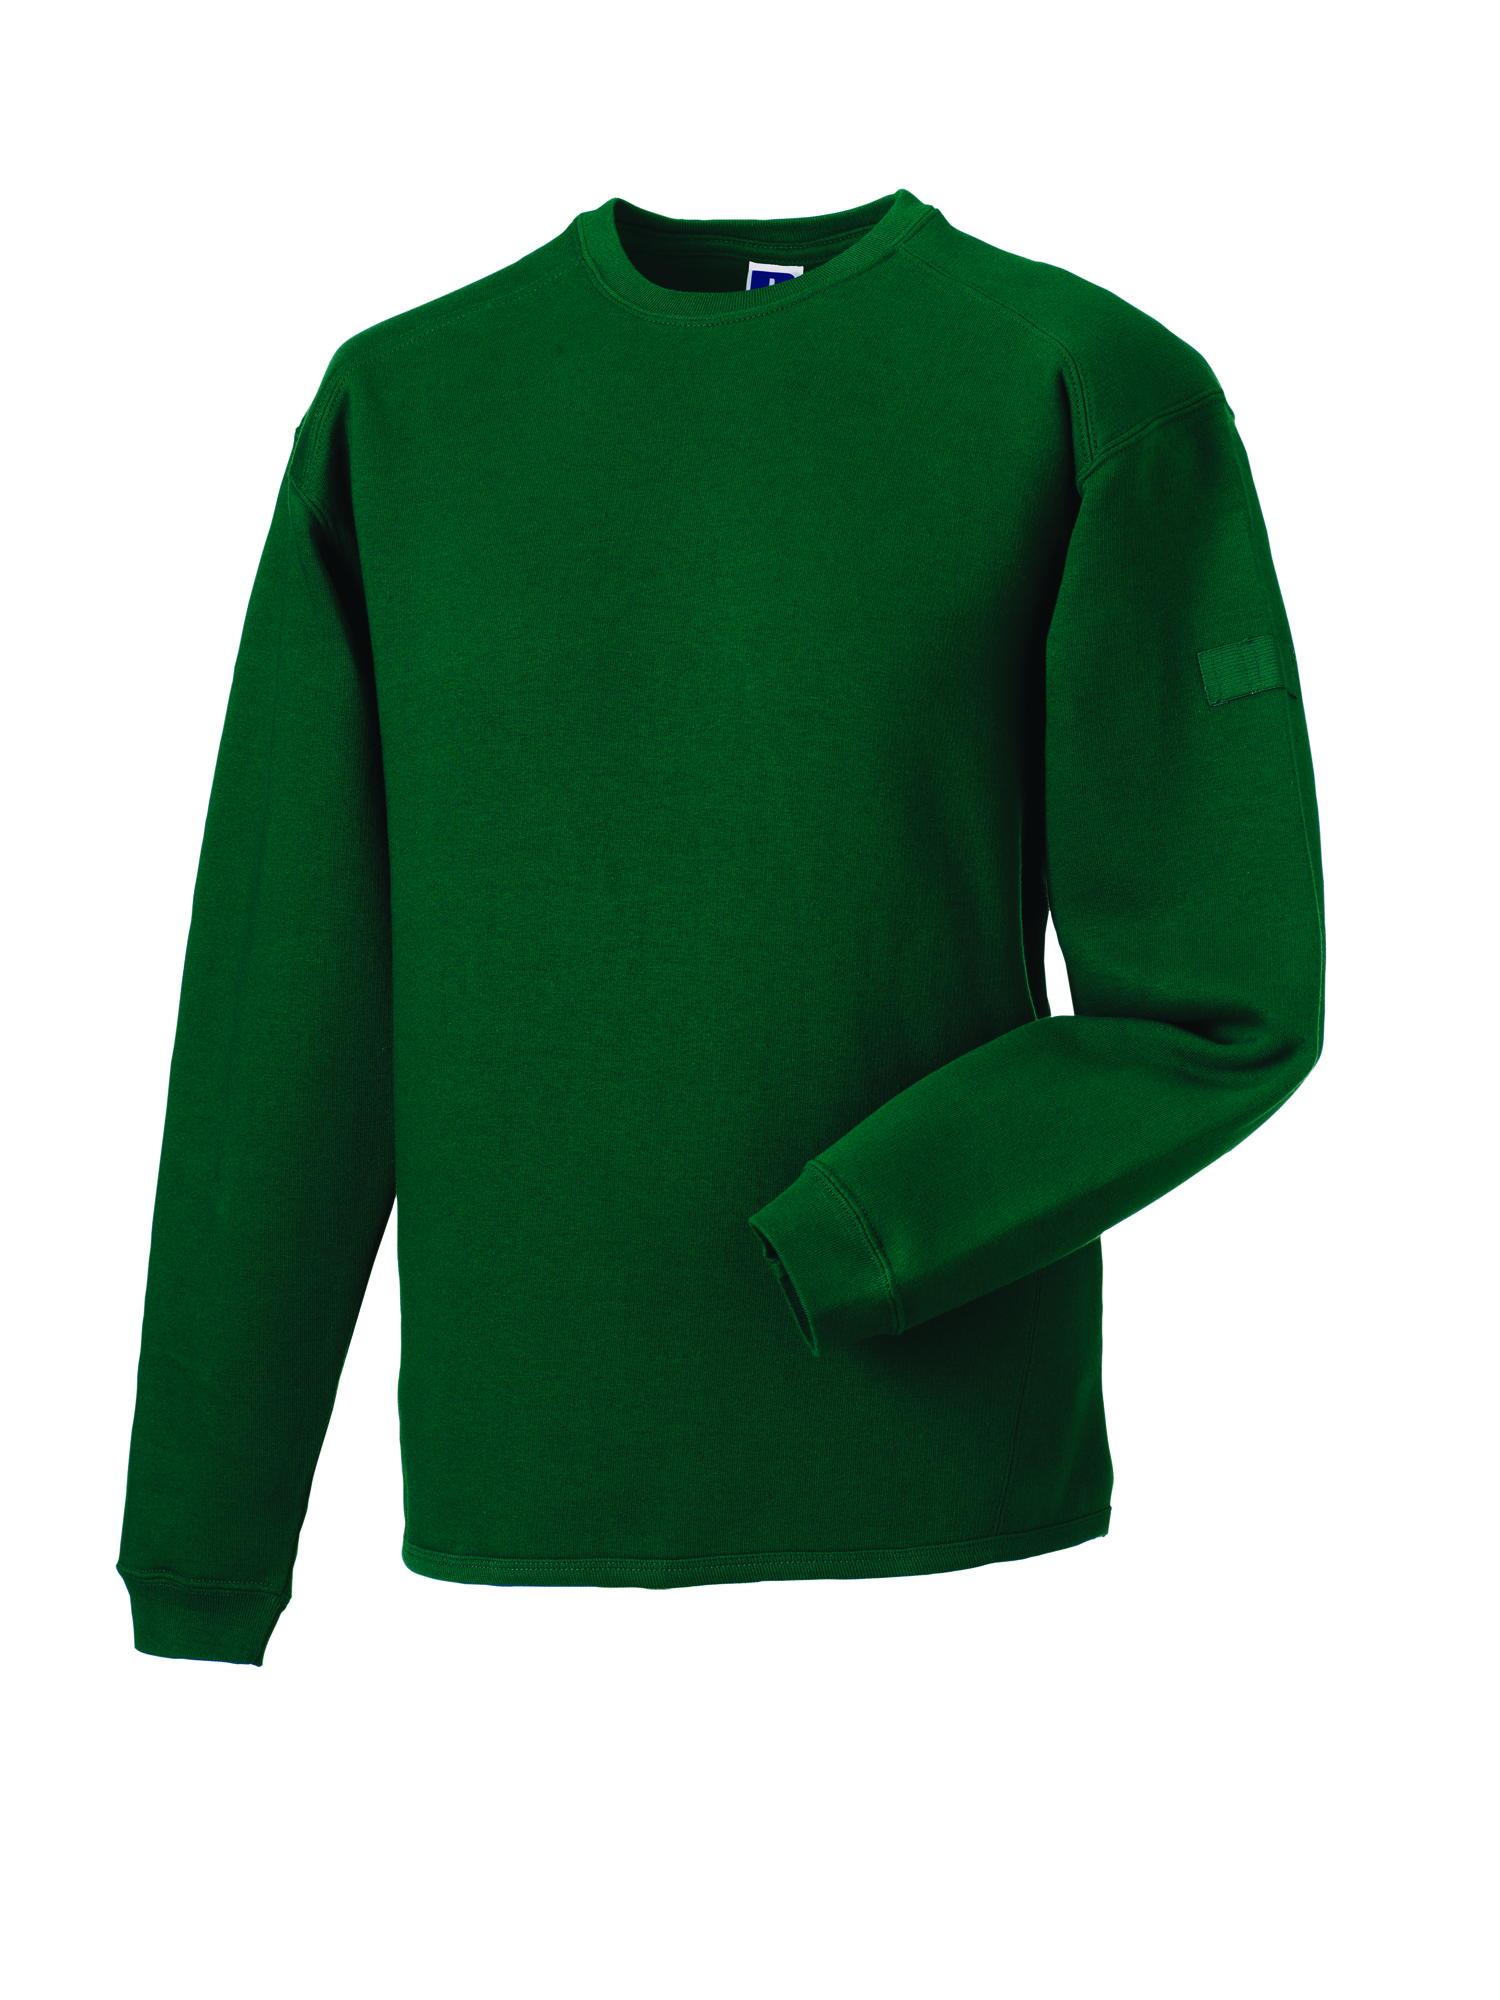 Heavy Duty Crewneck Sweatshirt - Bright Royal - XS